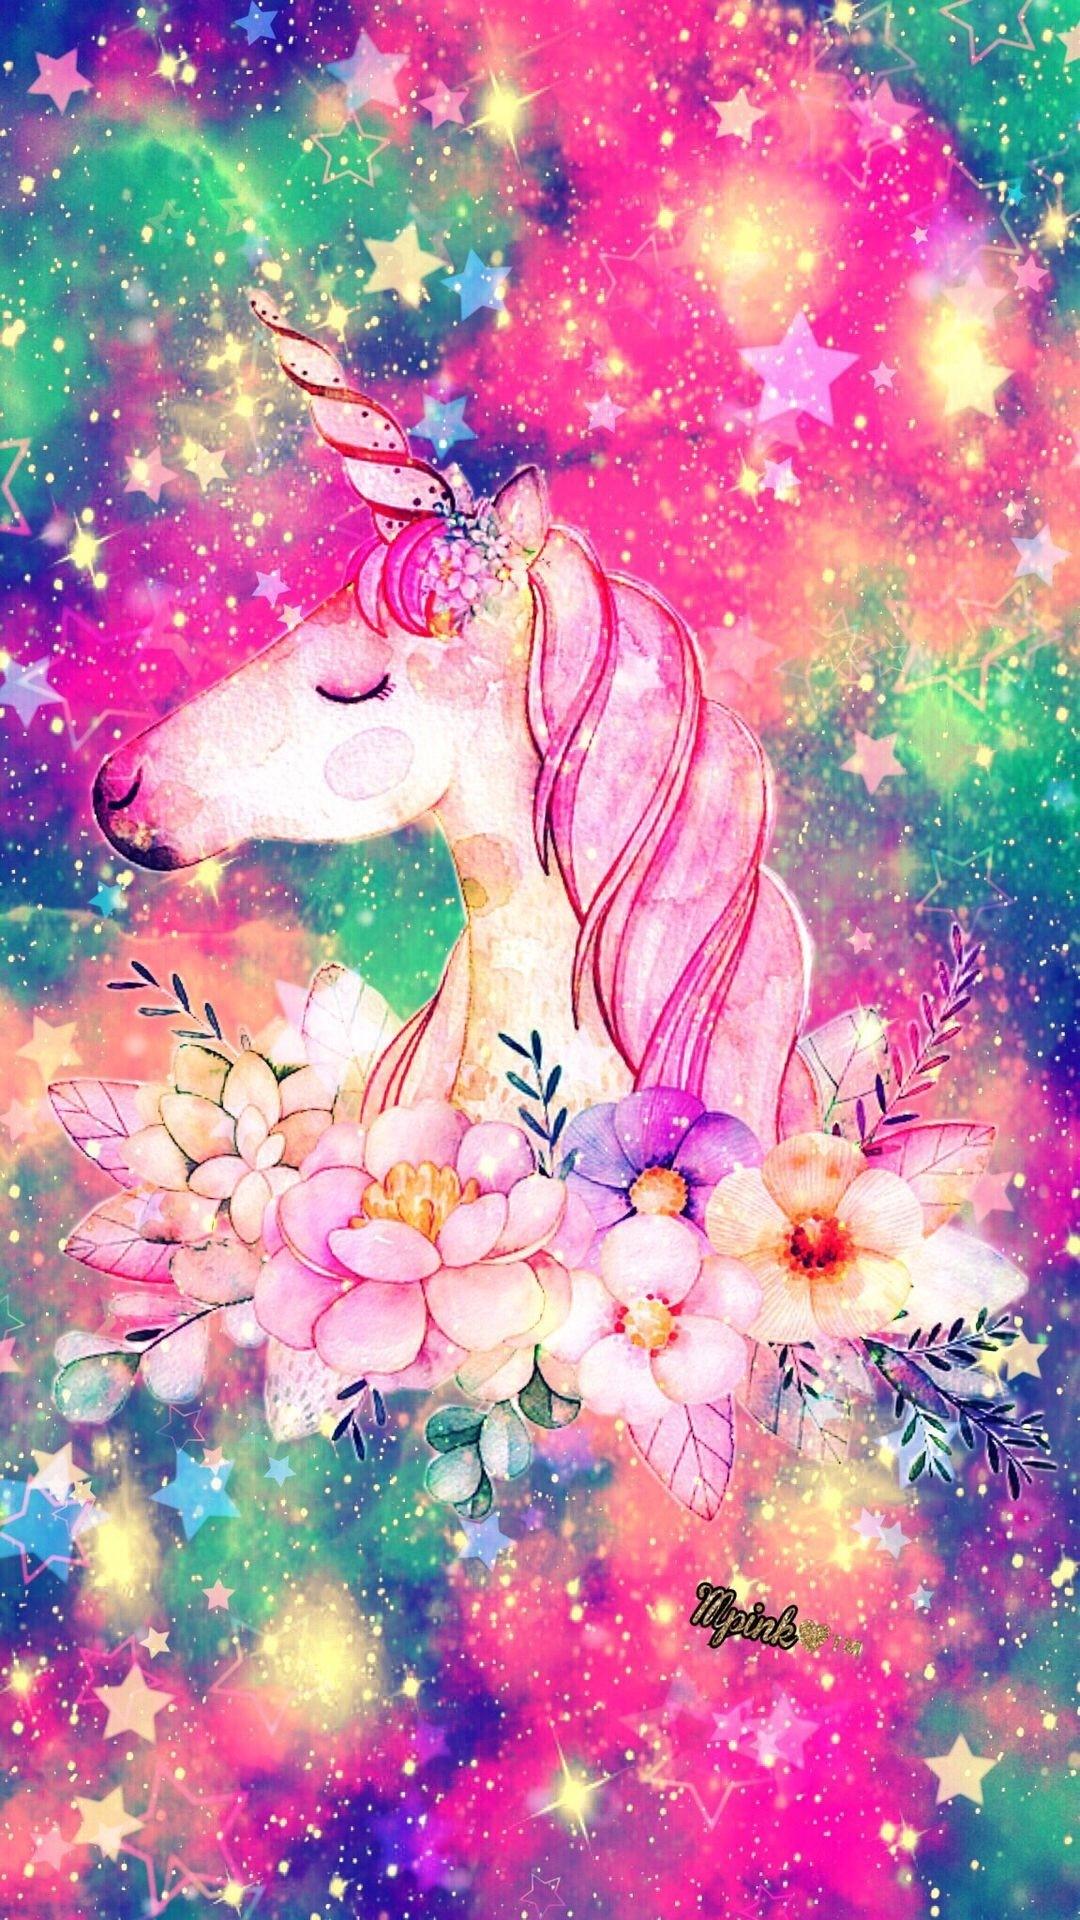 Unicorn iPhone hd wallpaper